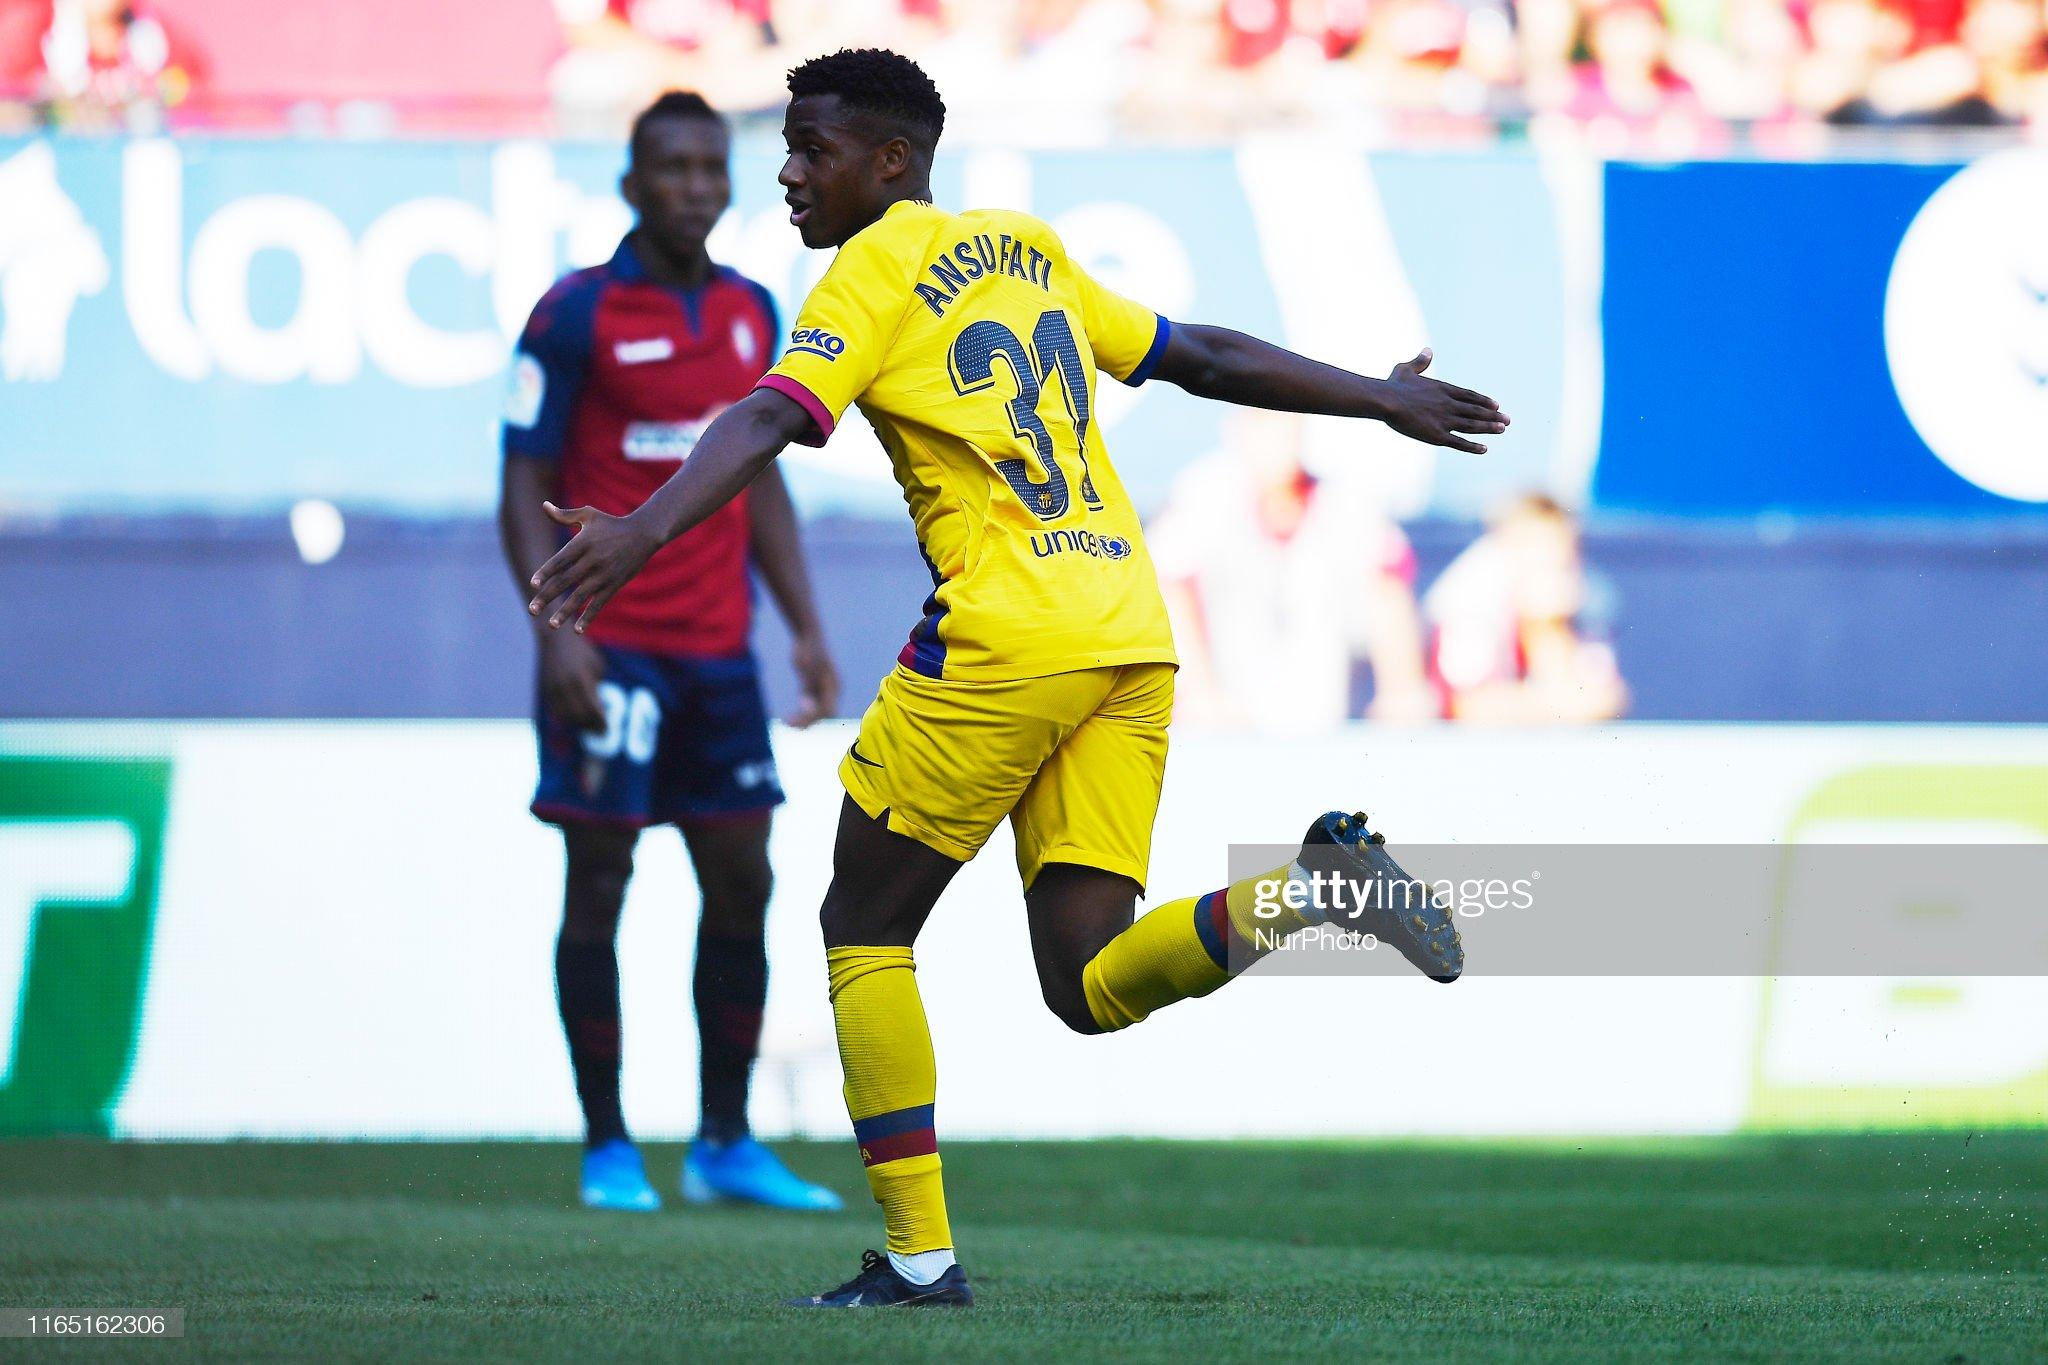 صور مباراة : أوساسونا - برشلونة 2-2 ( 31-08-2019 )  Ansu-fati-of-barcelona-celebrates-after-scoring-his-sides-first-goal-picture-id1165162306?s=2048x2048